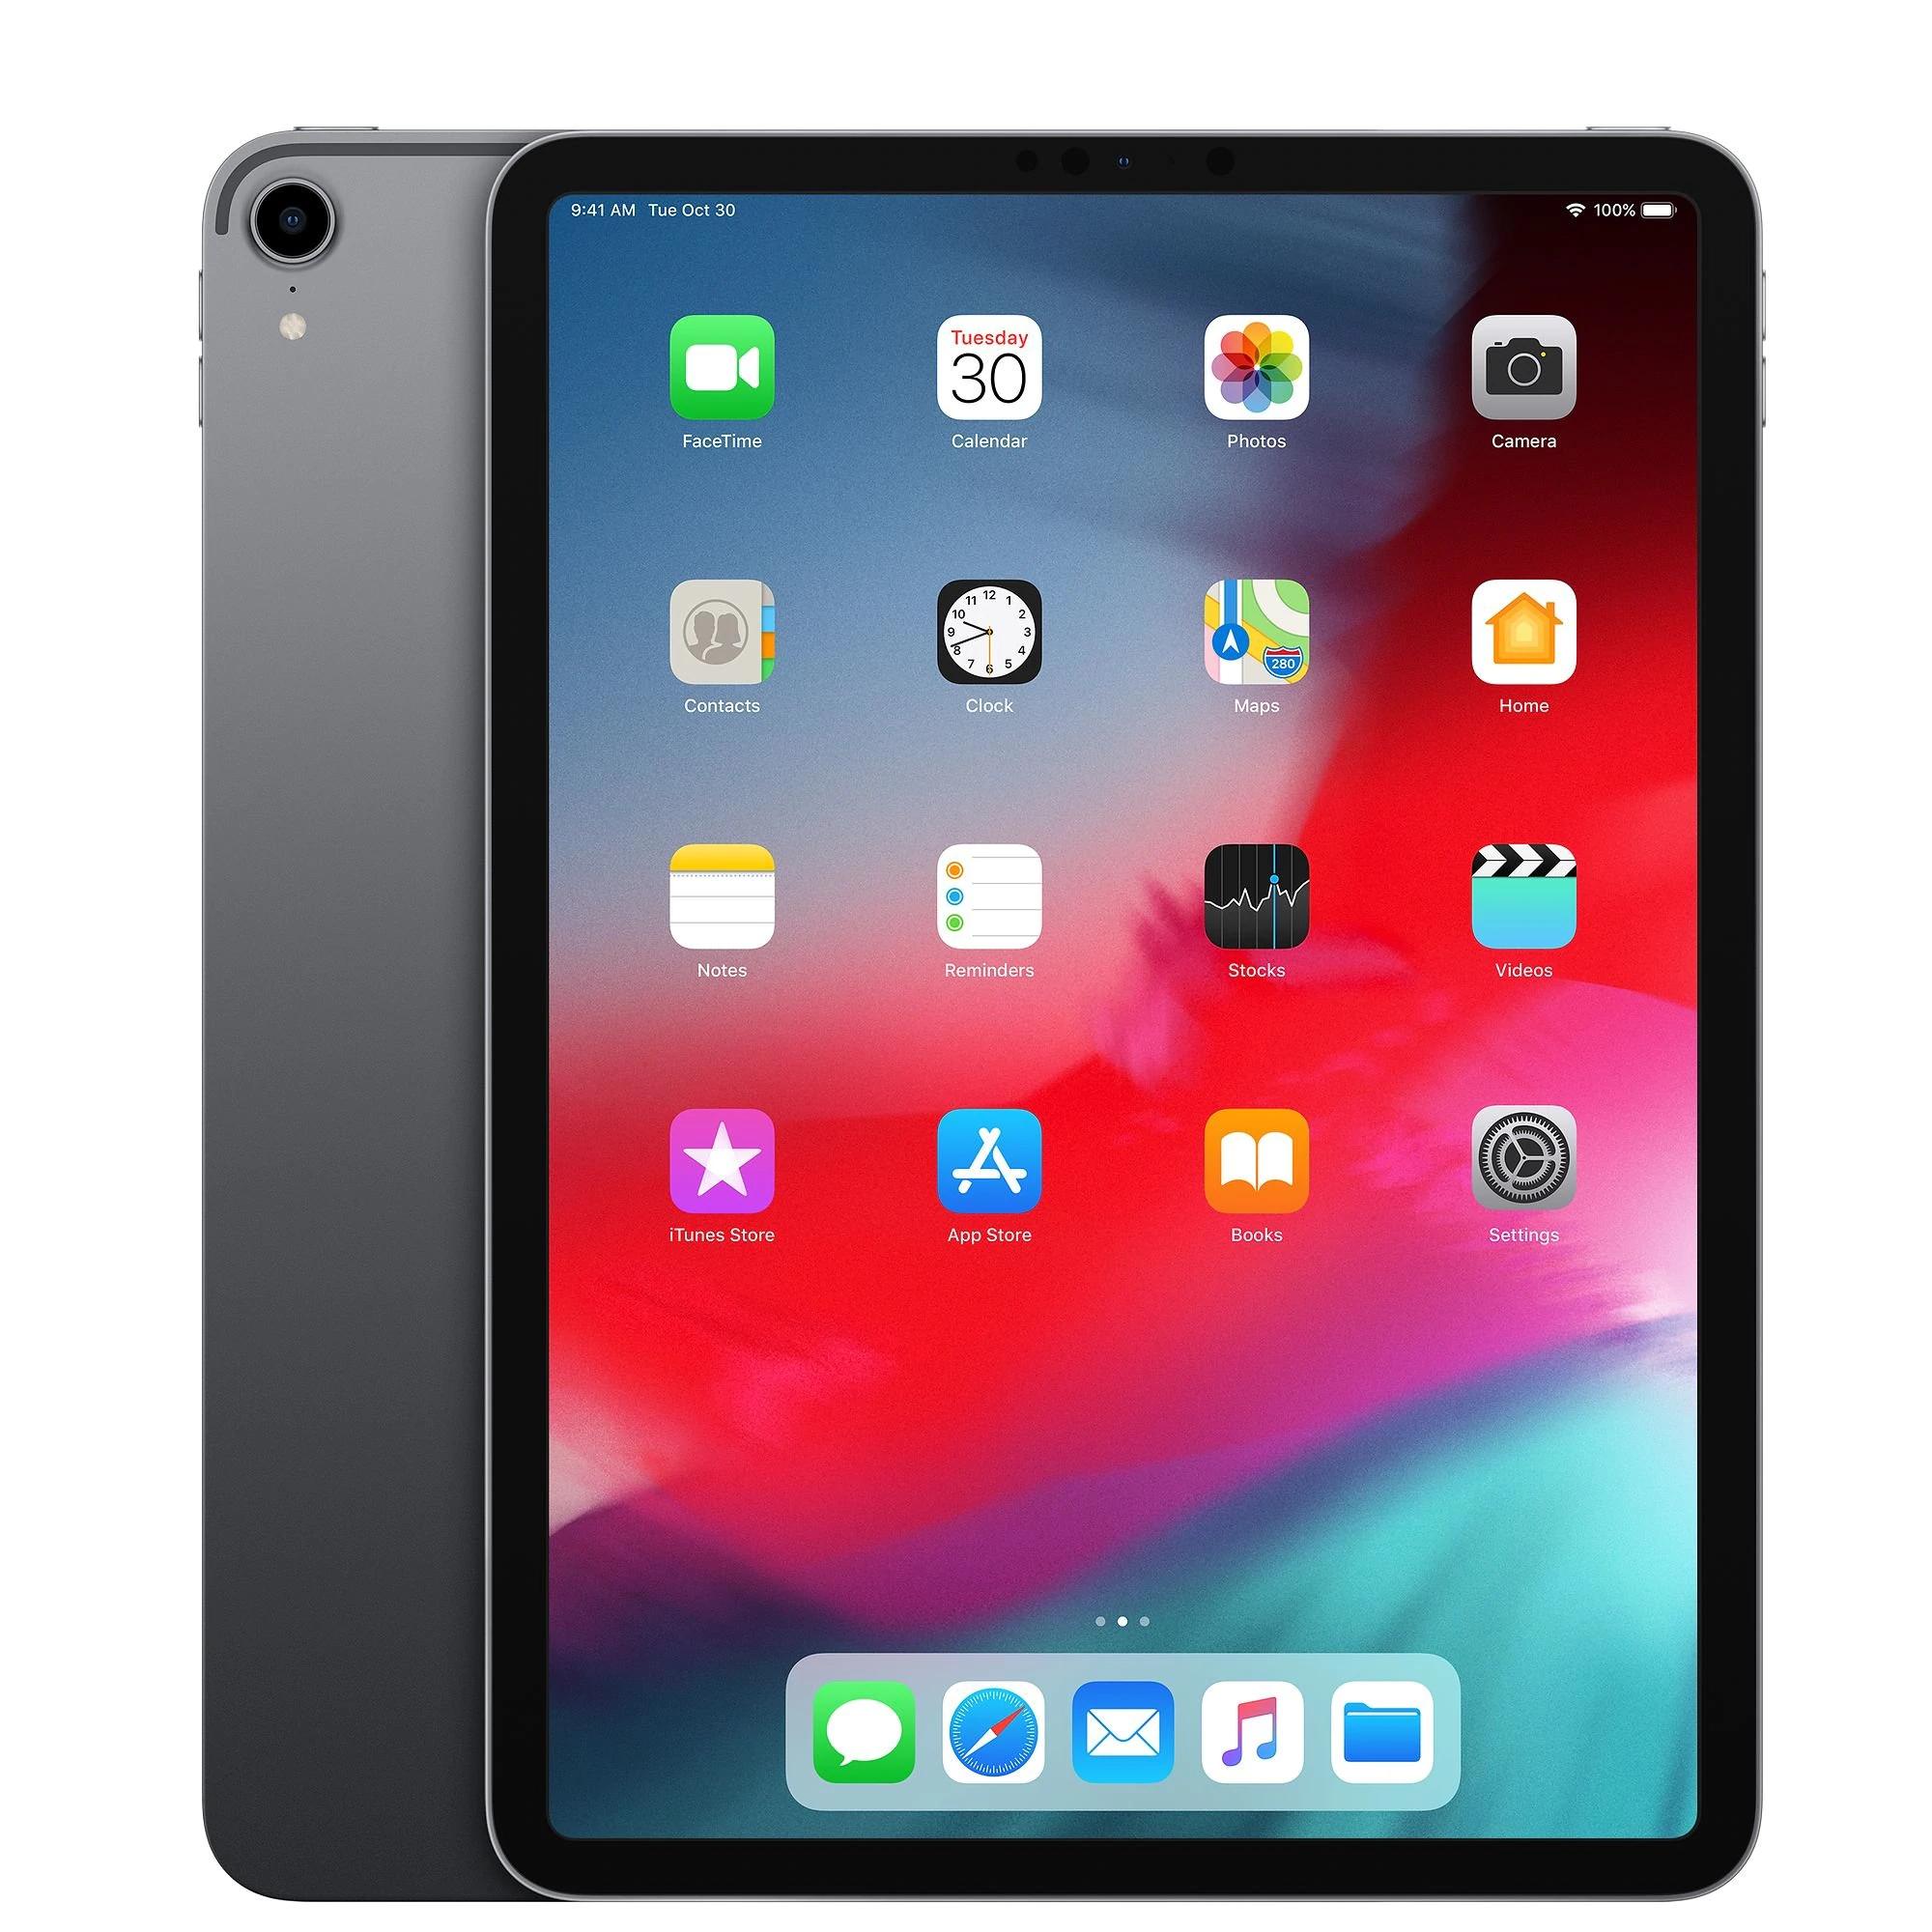 iPad Apple Pro 11 Wi-Fi + Cellular 64GB - Gwiezdna szarość